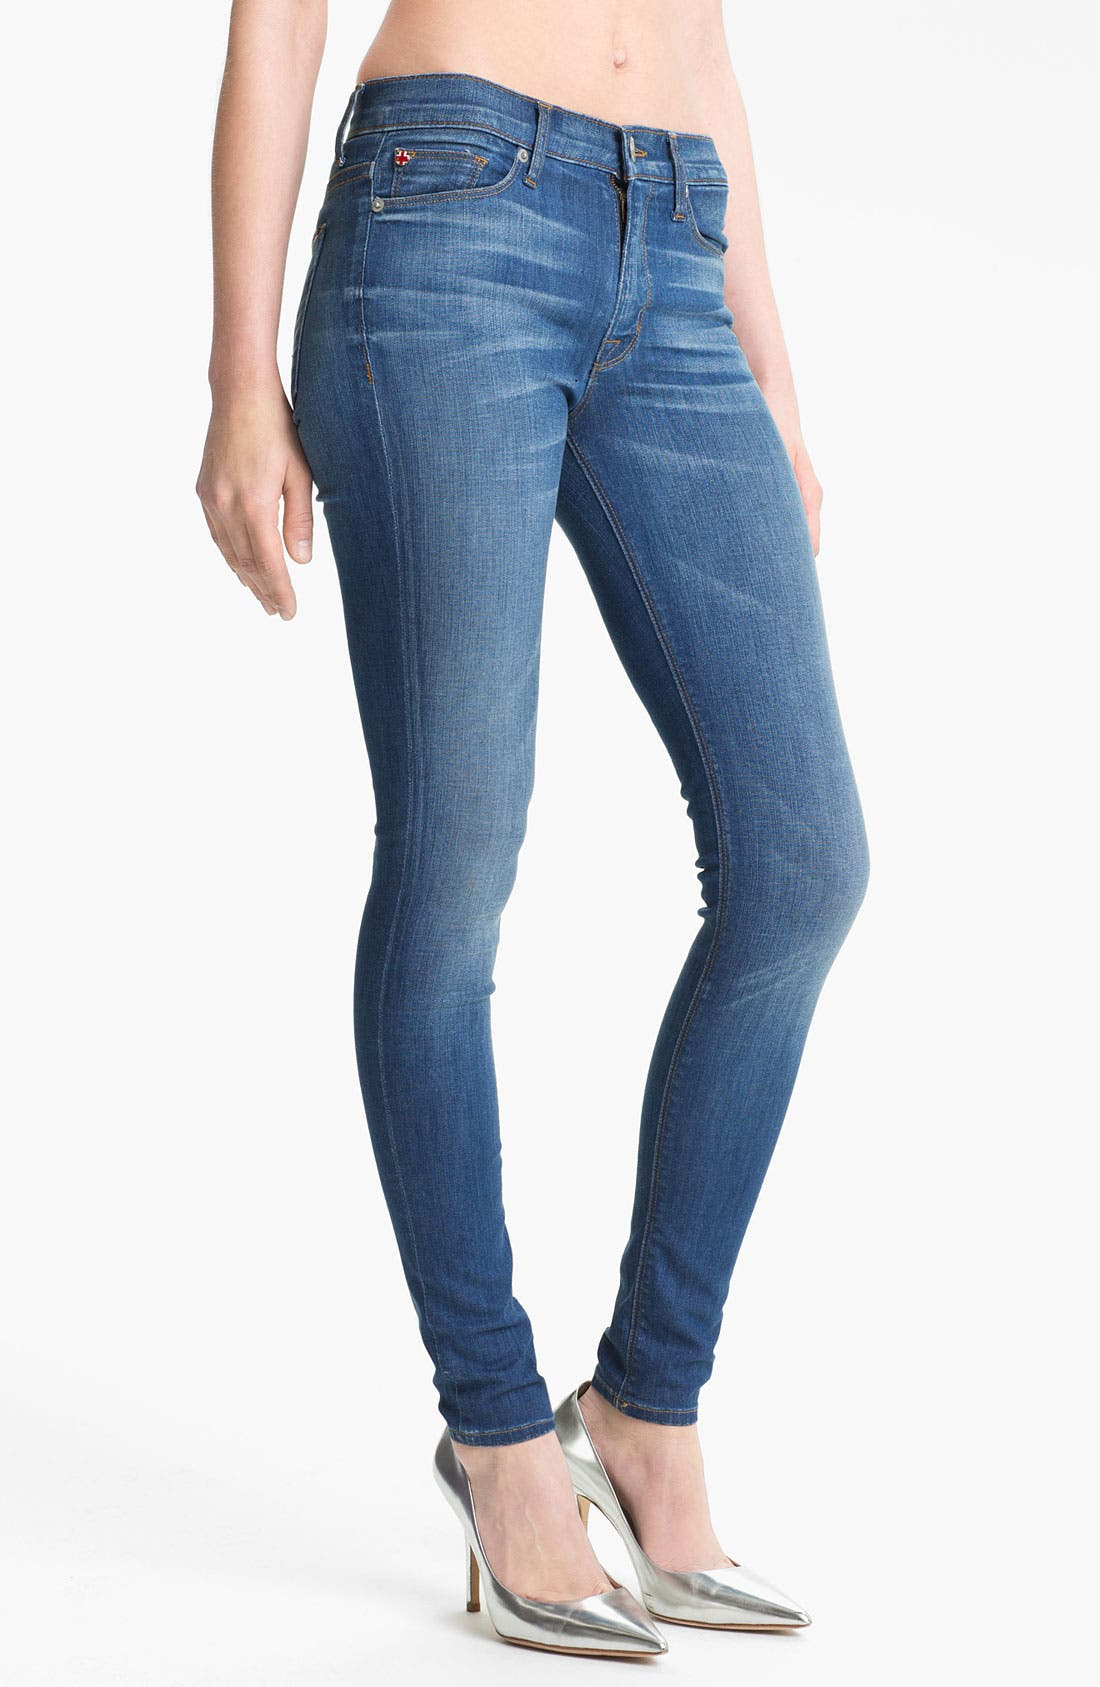 Main Image - Hudson Jeans 'Nico' Skinny Stretch Jeans (Morrissey)